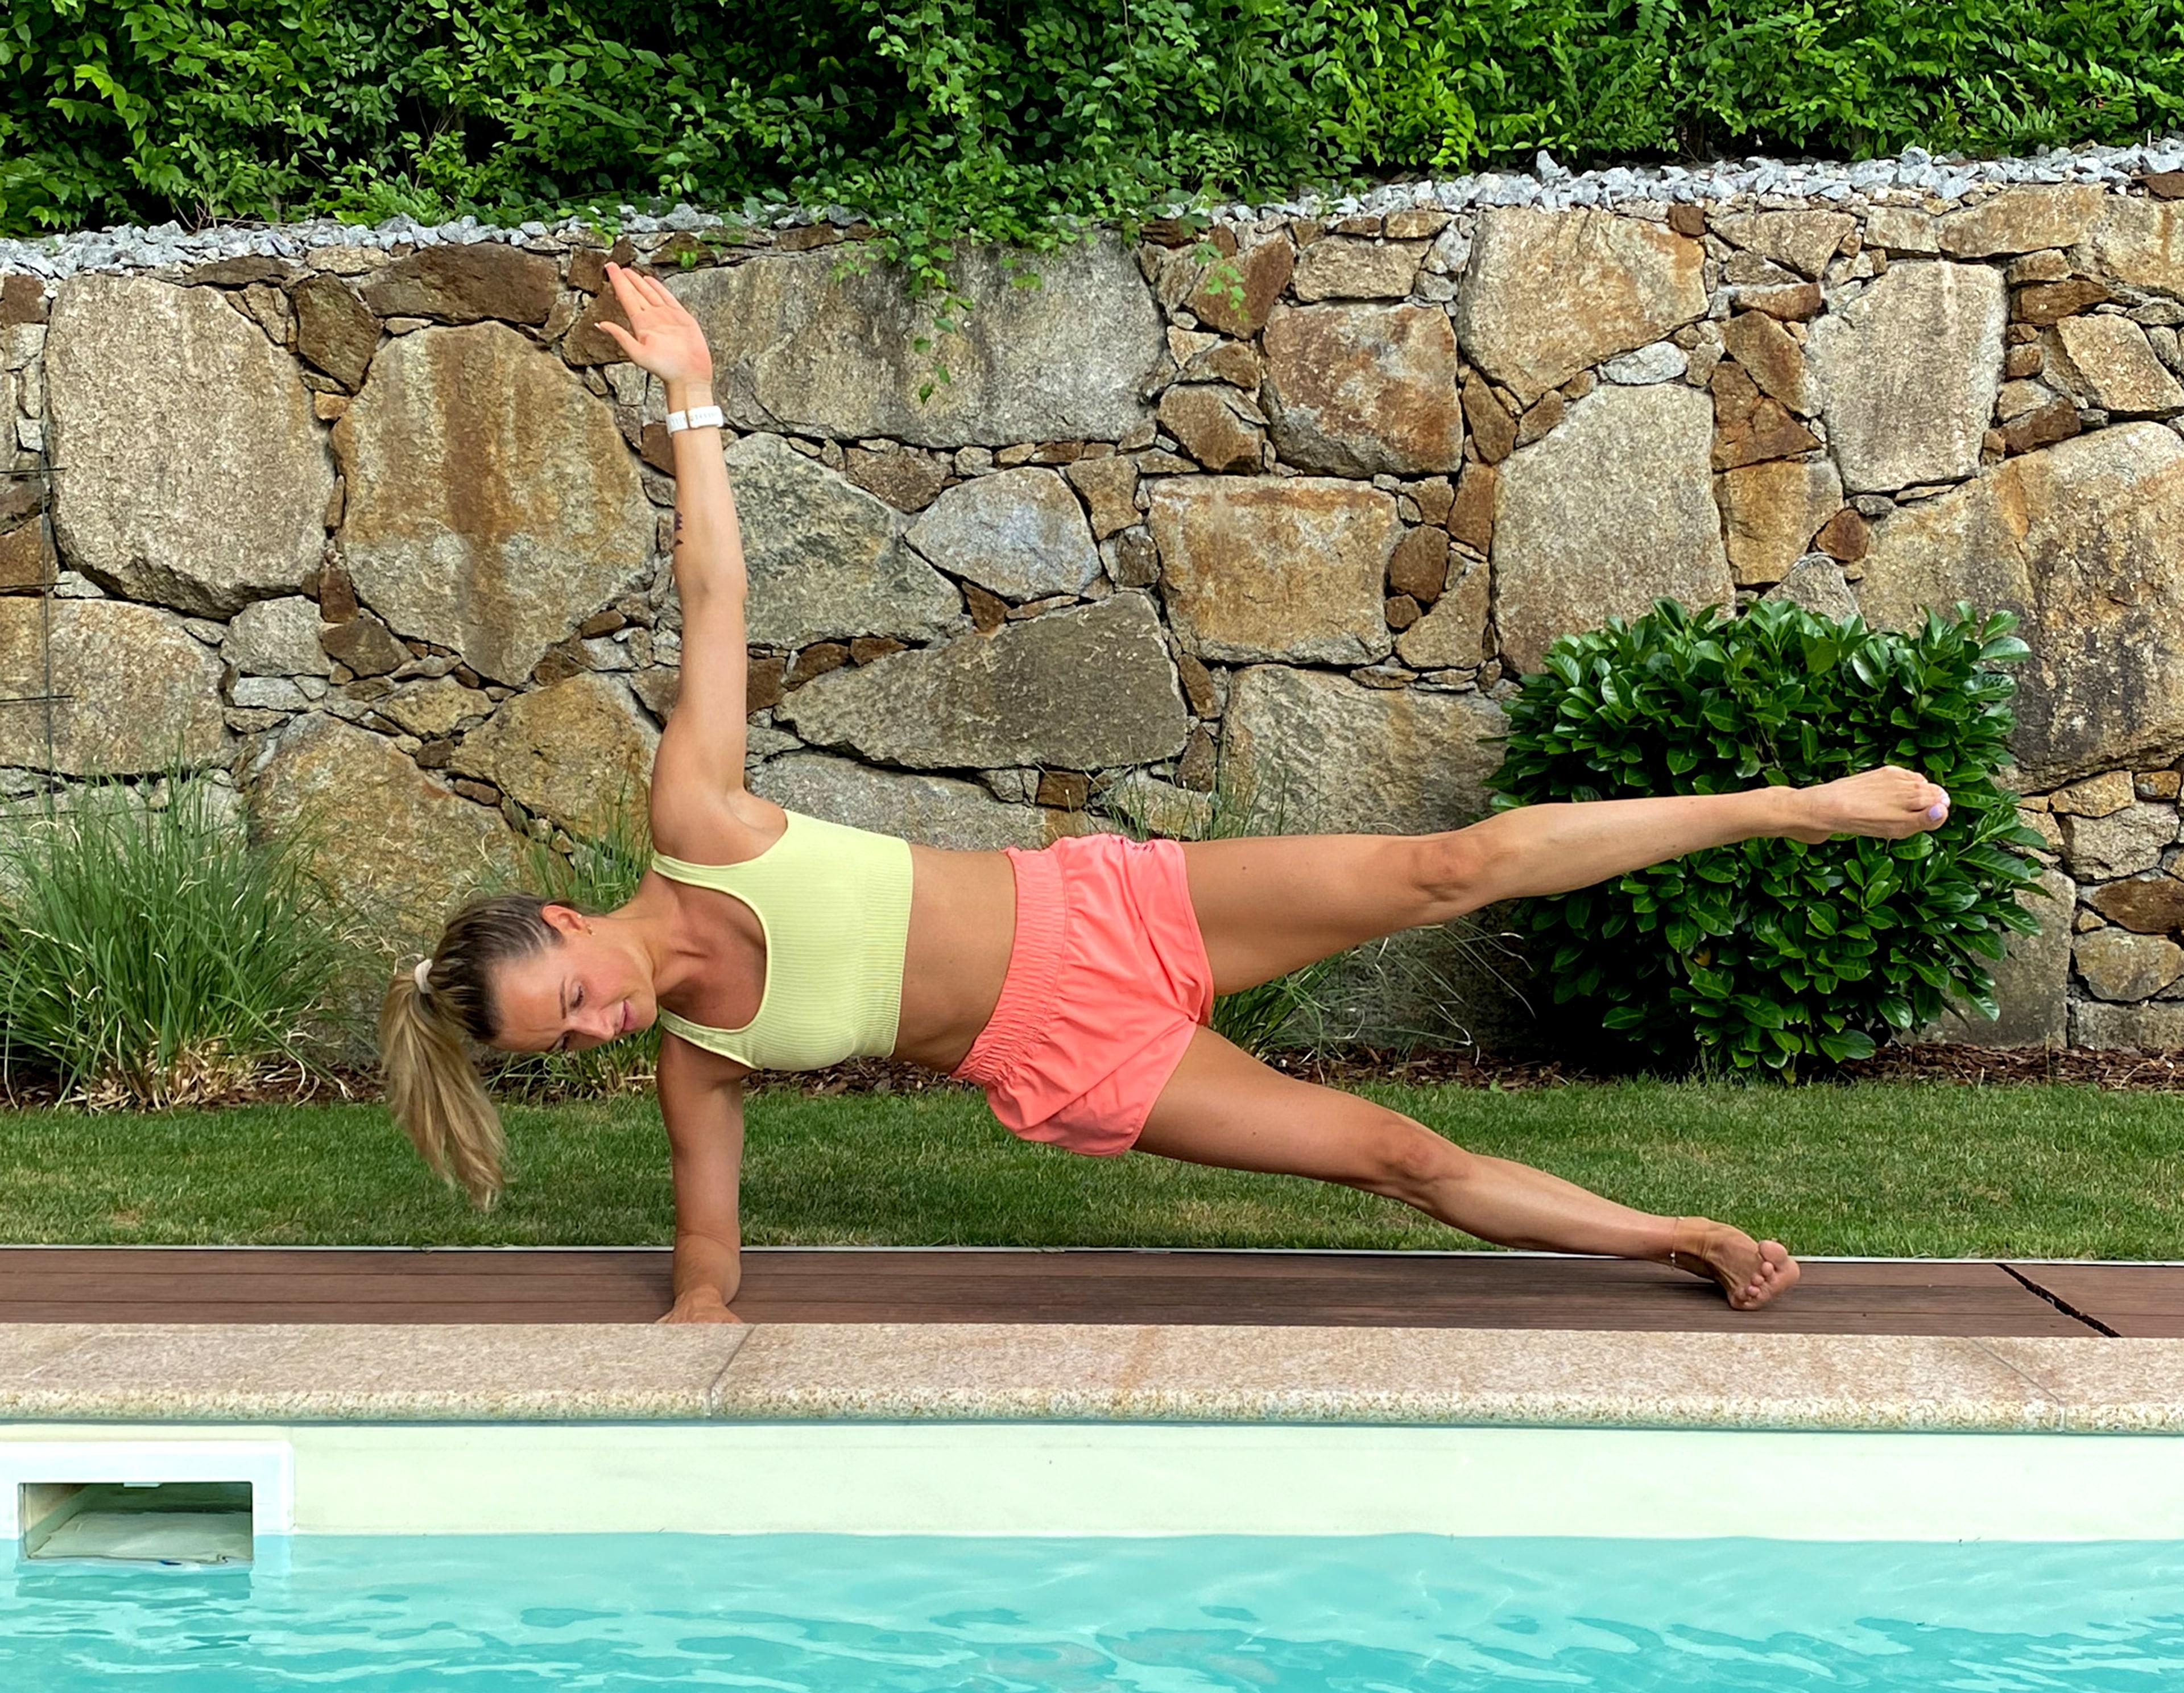 Bikinifigur City Magdalena Henkel menafit Side Plank Leg Lift Endposition